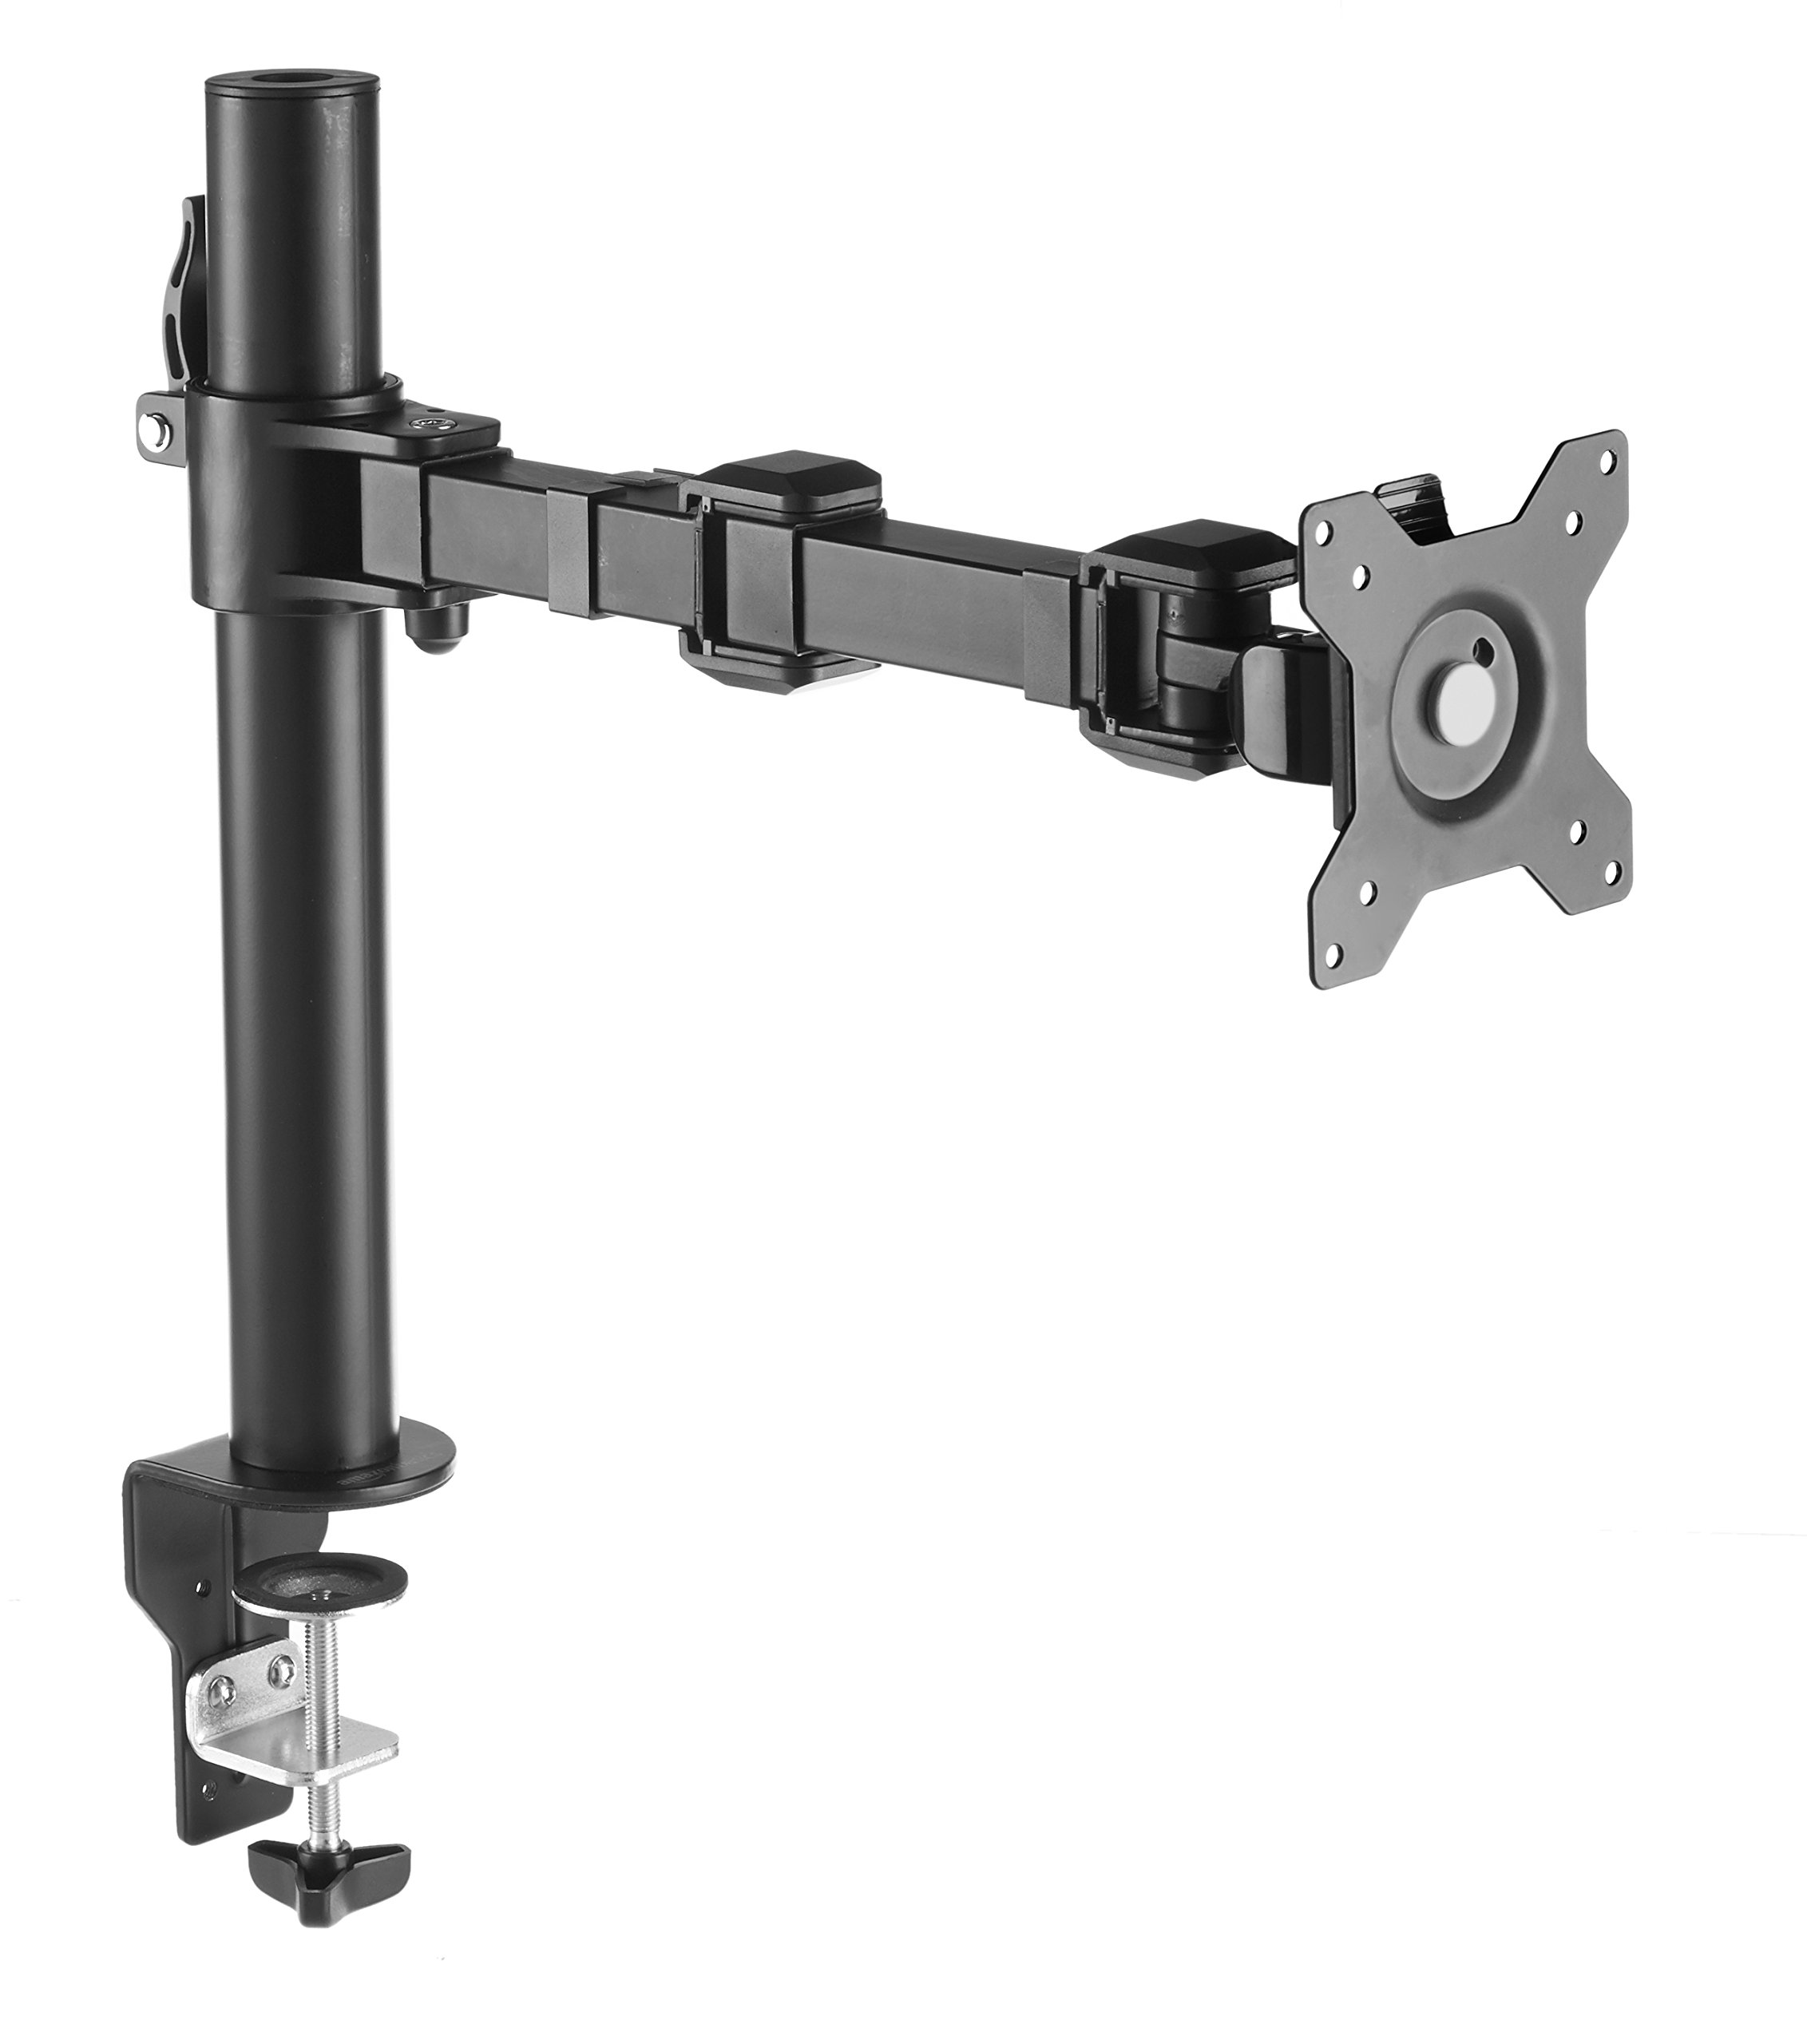 AmazonBasics Single Monitor Stand – Height Adjustable Arm Mount, Steel